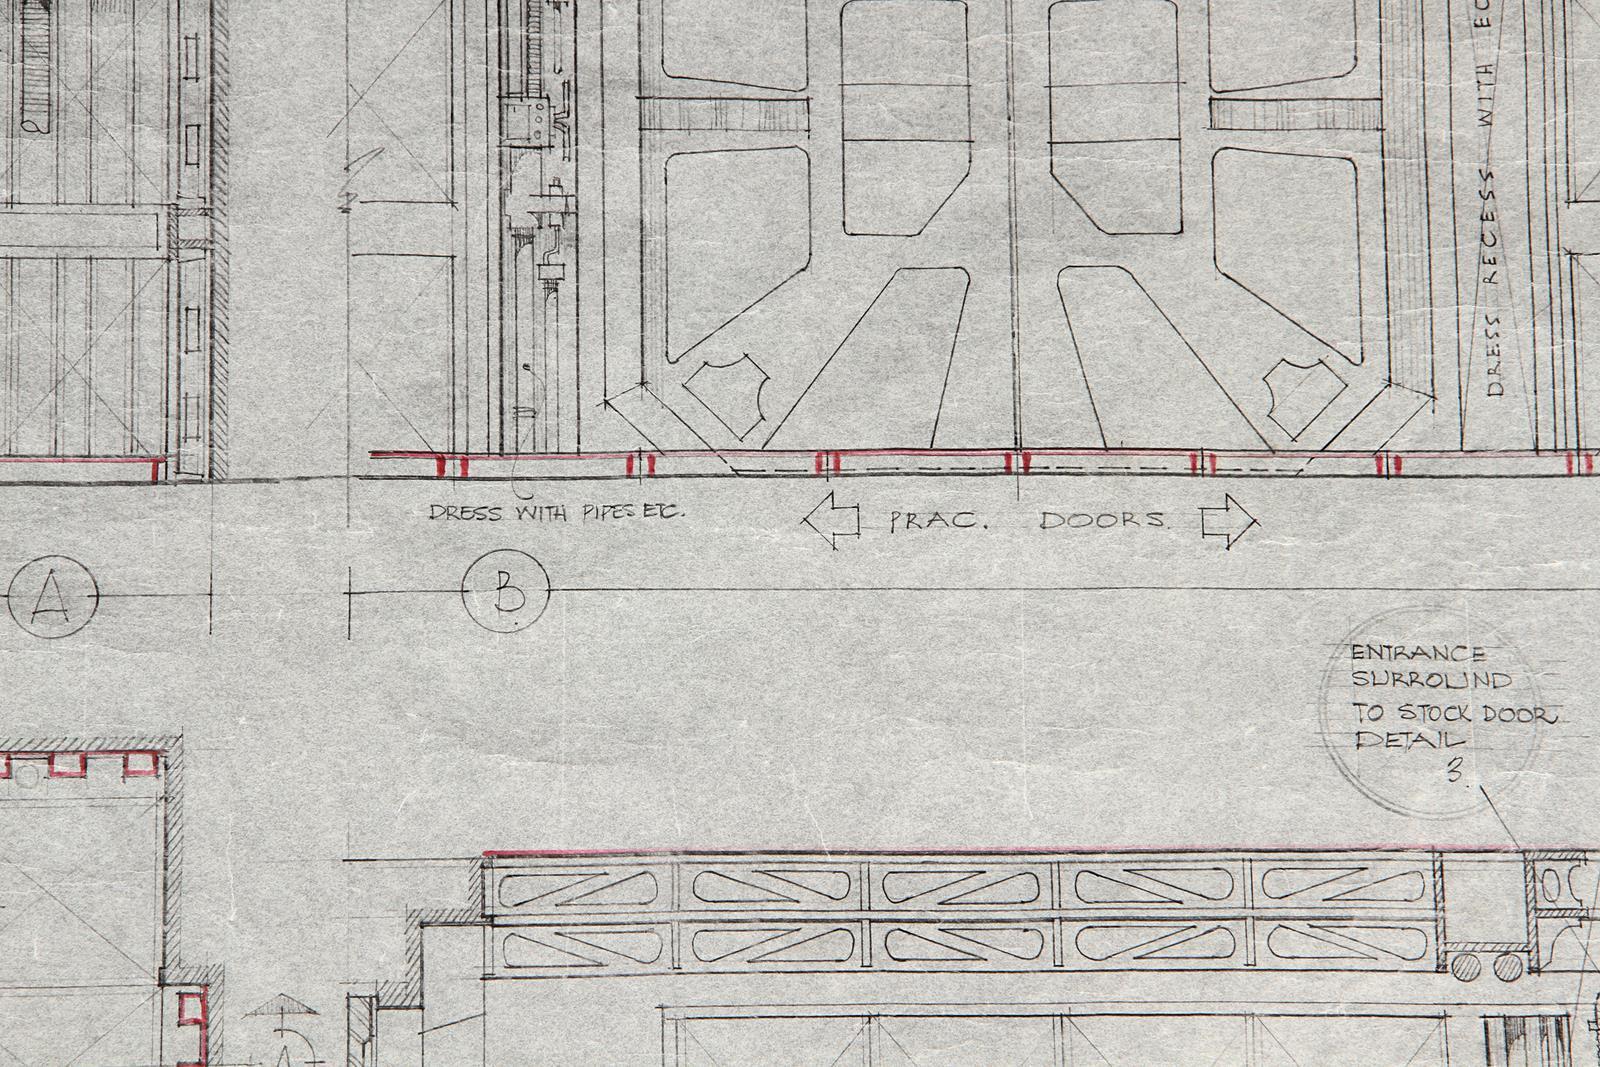 ALIEN (1979) - Hand-Drawn Nostromo Hangar Pencil Illustration A hand-drawn pencil set illustration - Image 11 of 11